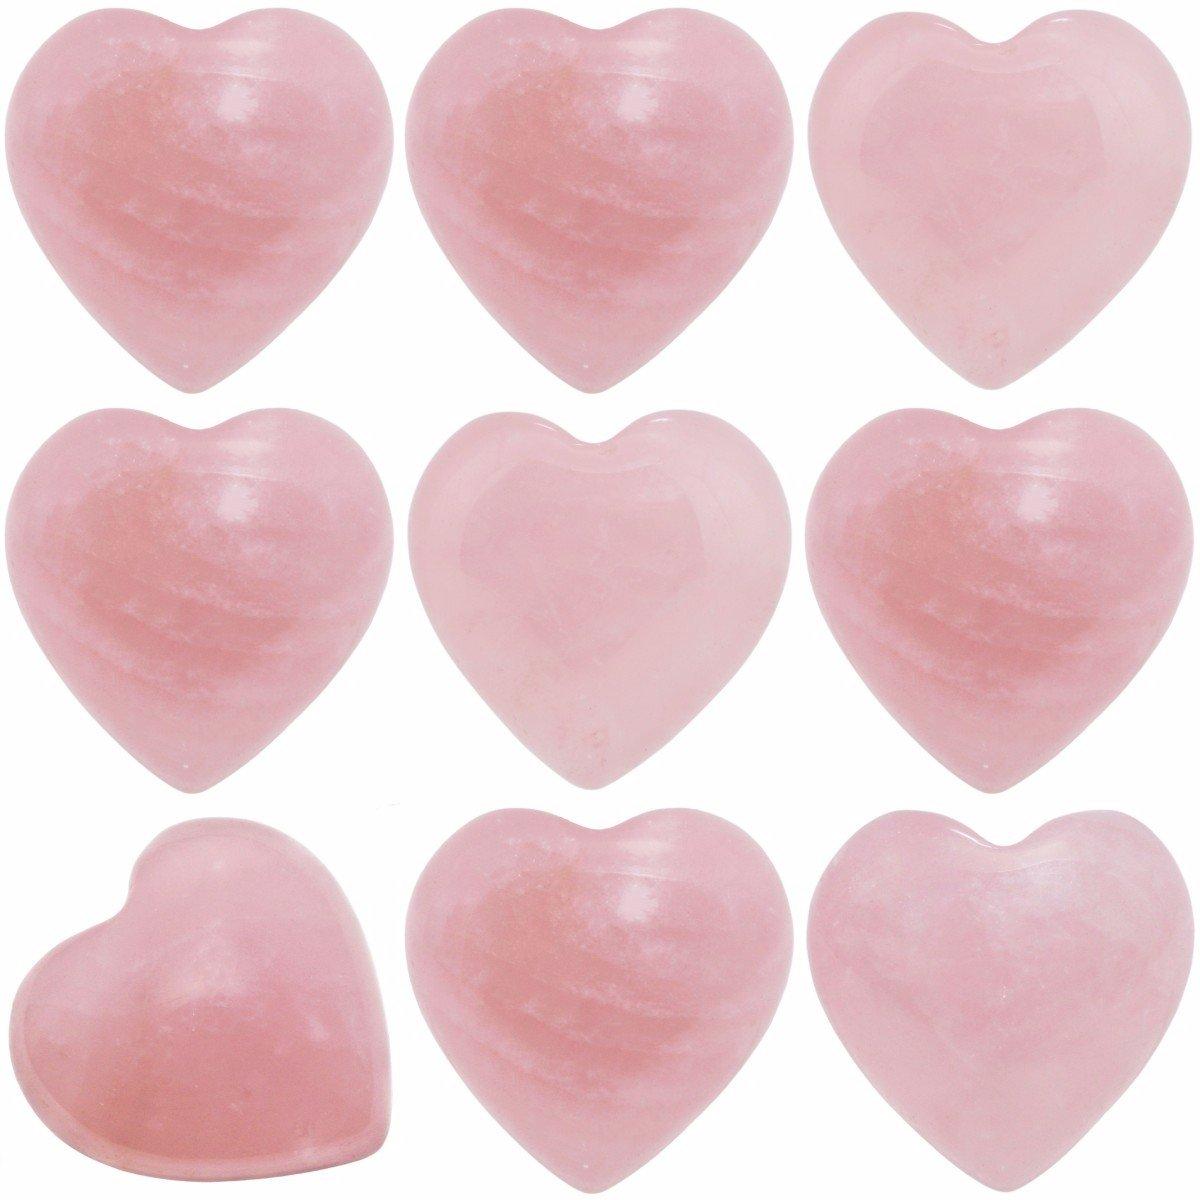 SUNYIK Natural Rose Quartz Pocket Mini Puff Heart Worry Healing Palm Stone Pack of 10(0.5'')